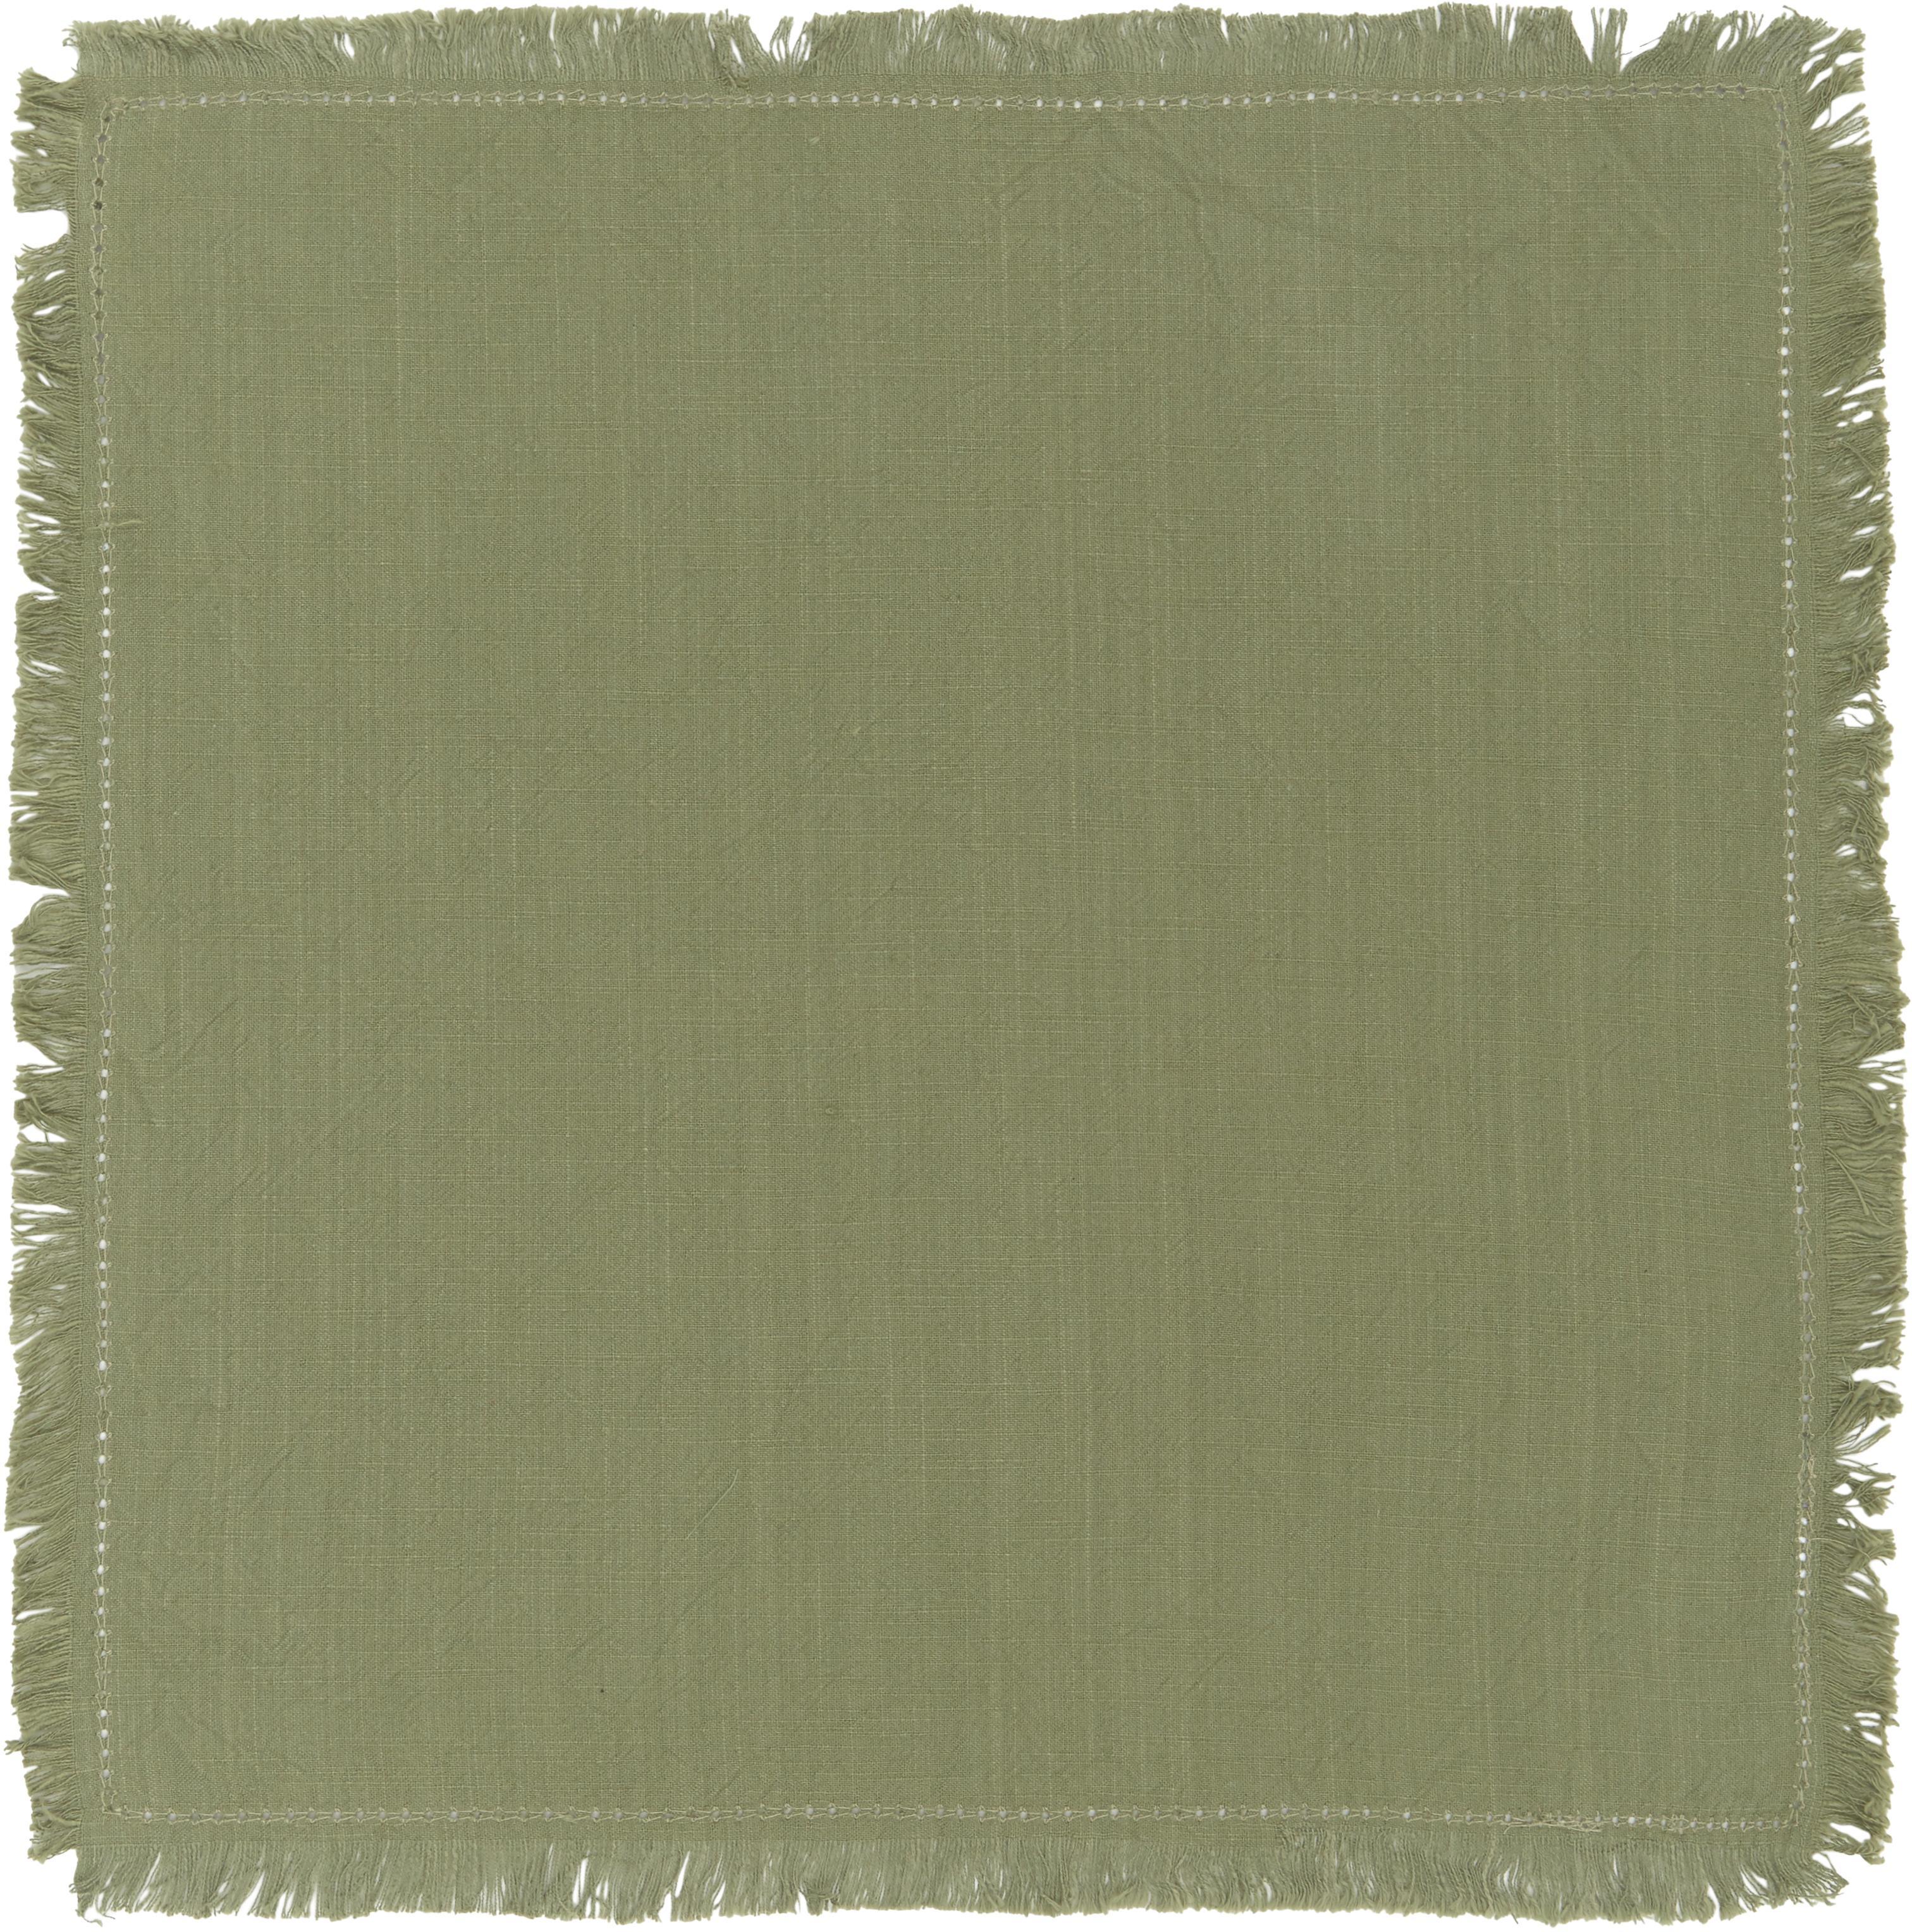 Servilletas de algodón Hilma, 2uds., Algodón, Verde oliva, L 31 cm